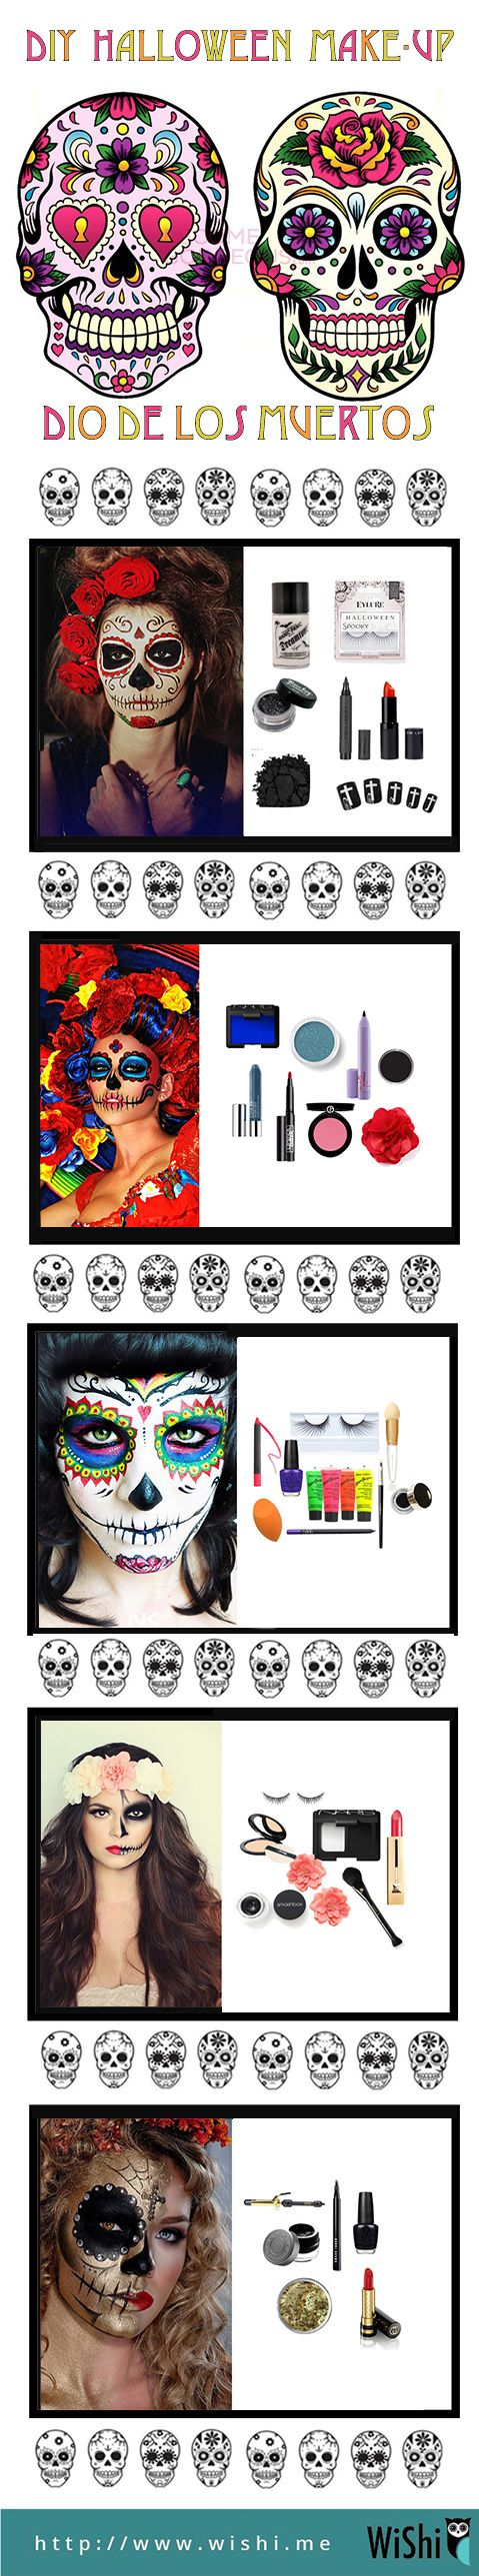 Fun makeup guide for what you'll need to do Dia de los Muertos / Halloween makeup.